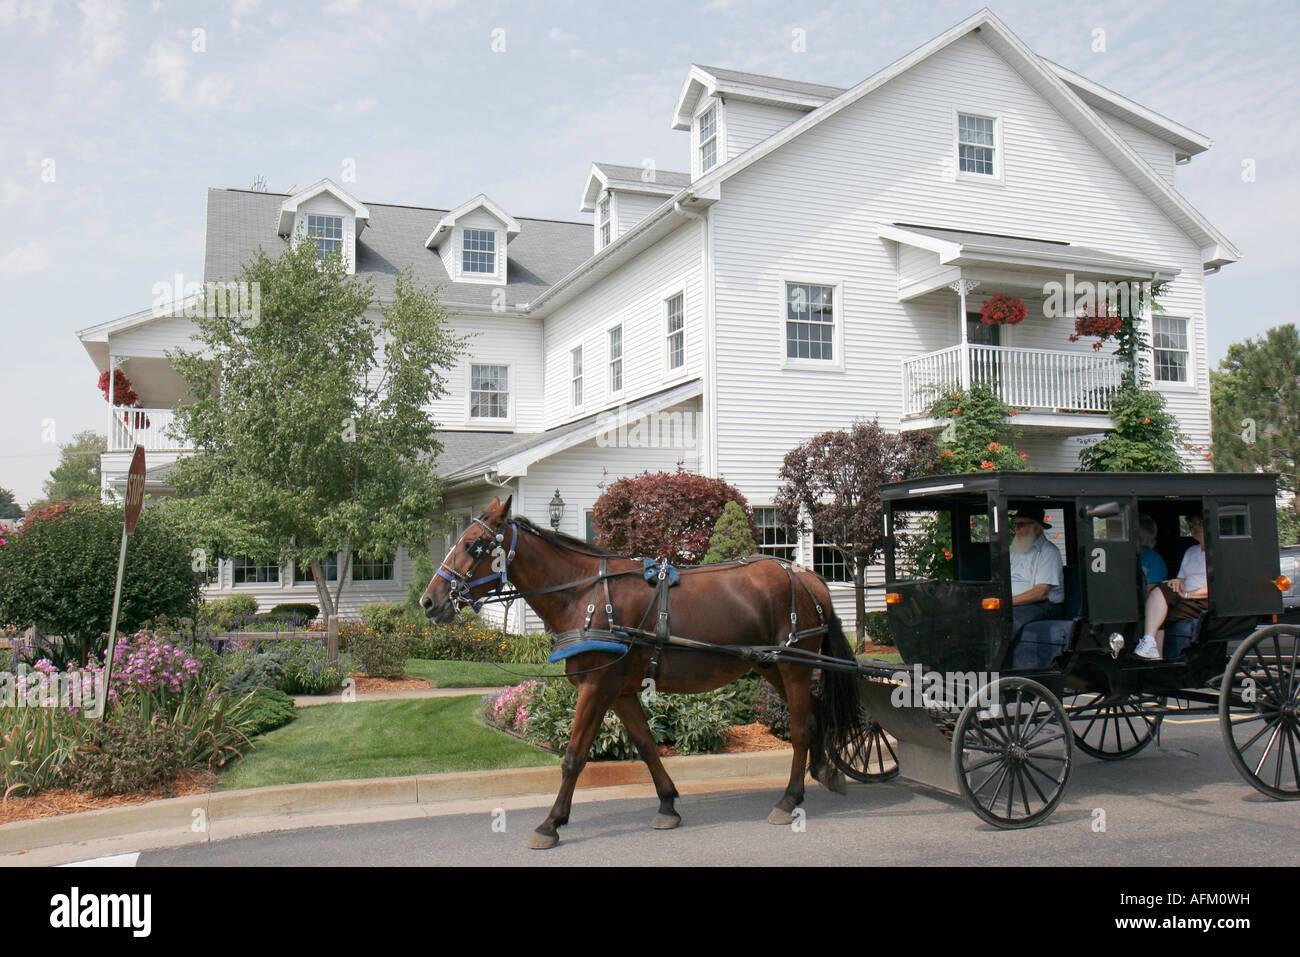 Indiana Shipshewana Harrison Street caballos amish buggy ride Imagen De  Stock 13fcc4e52fa